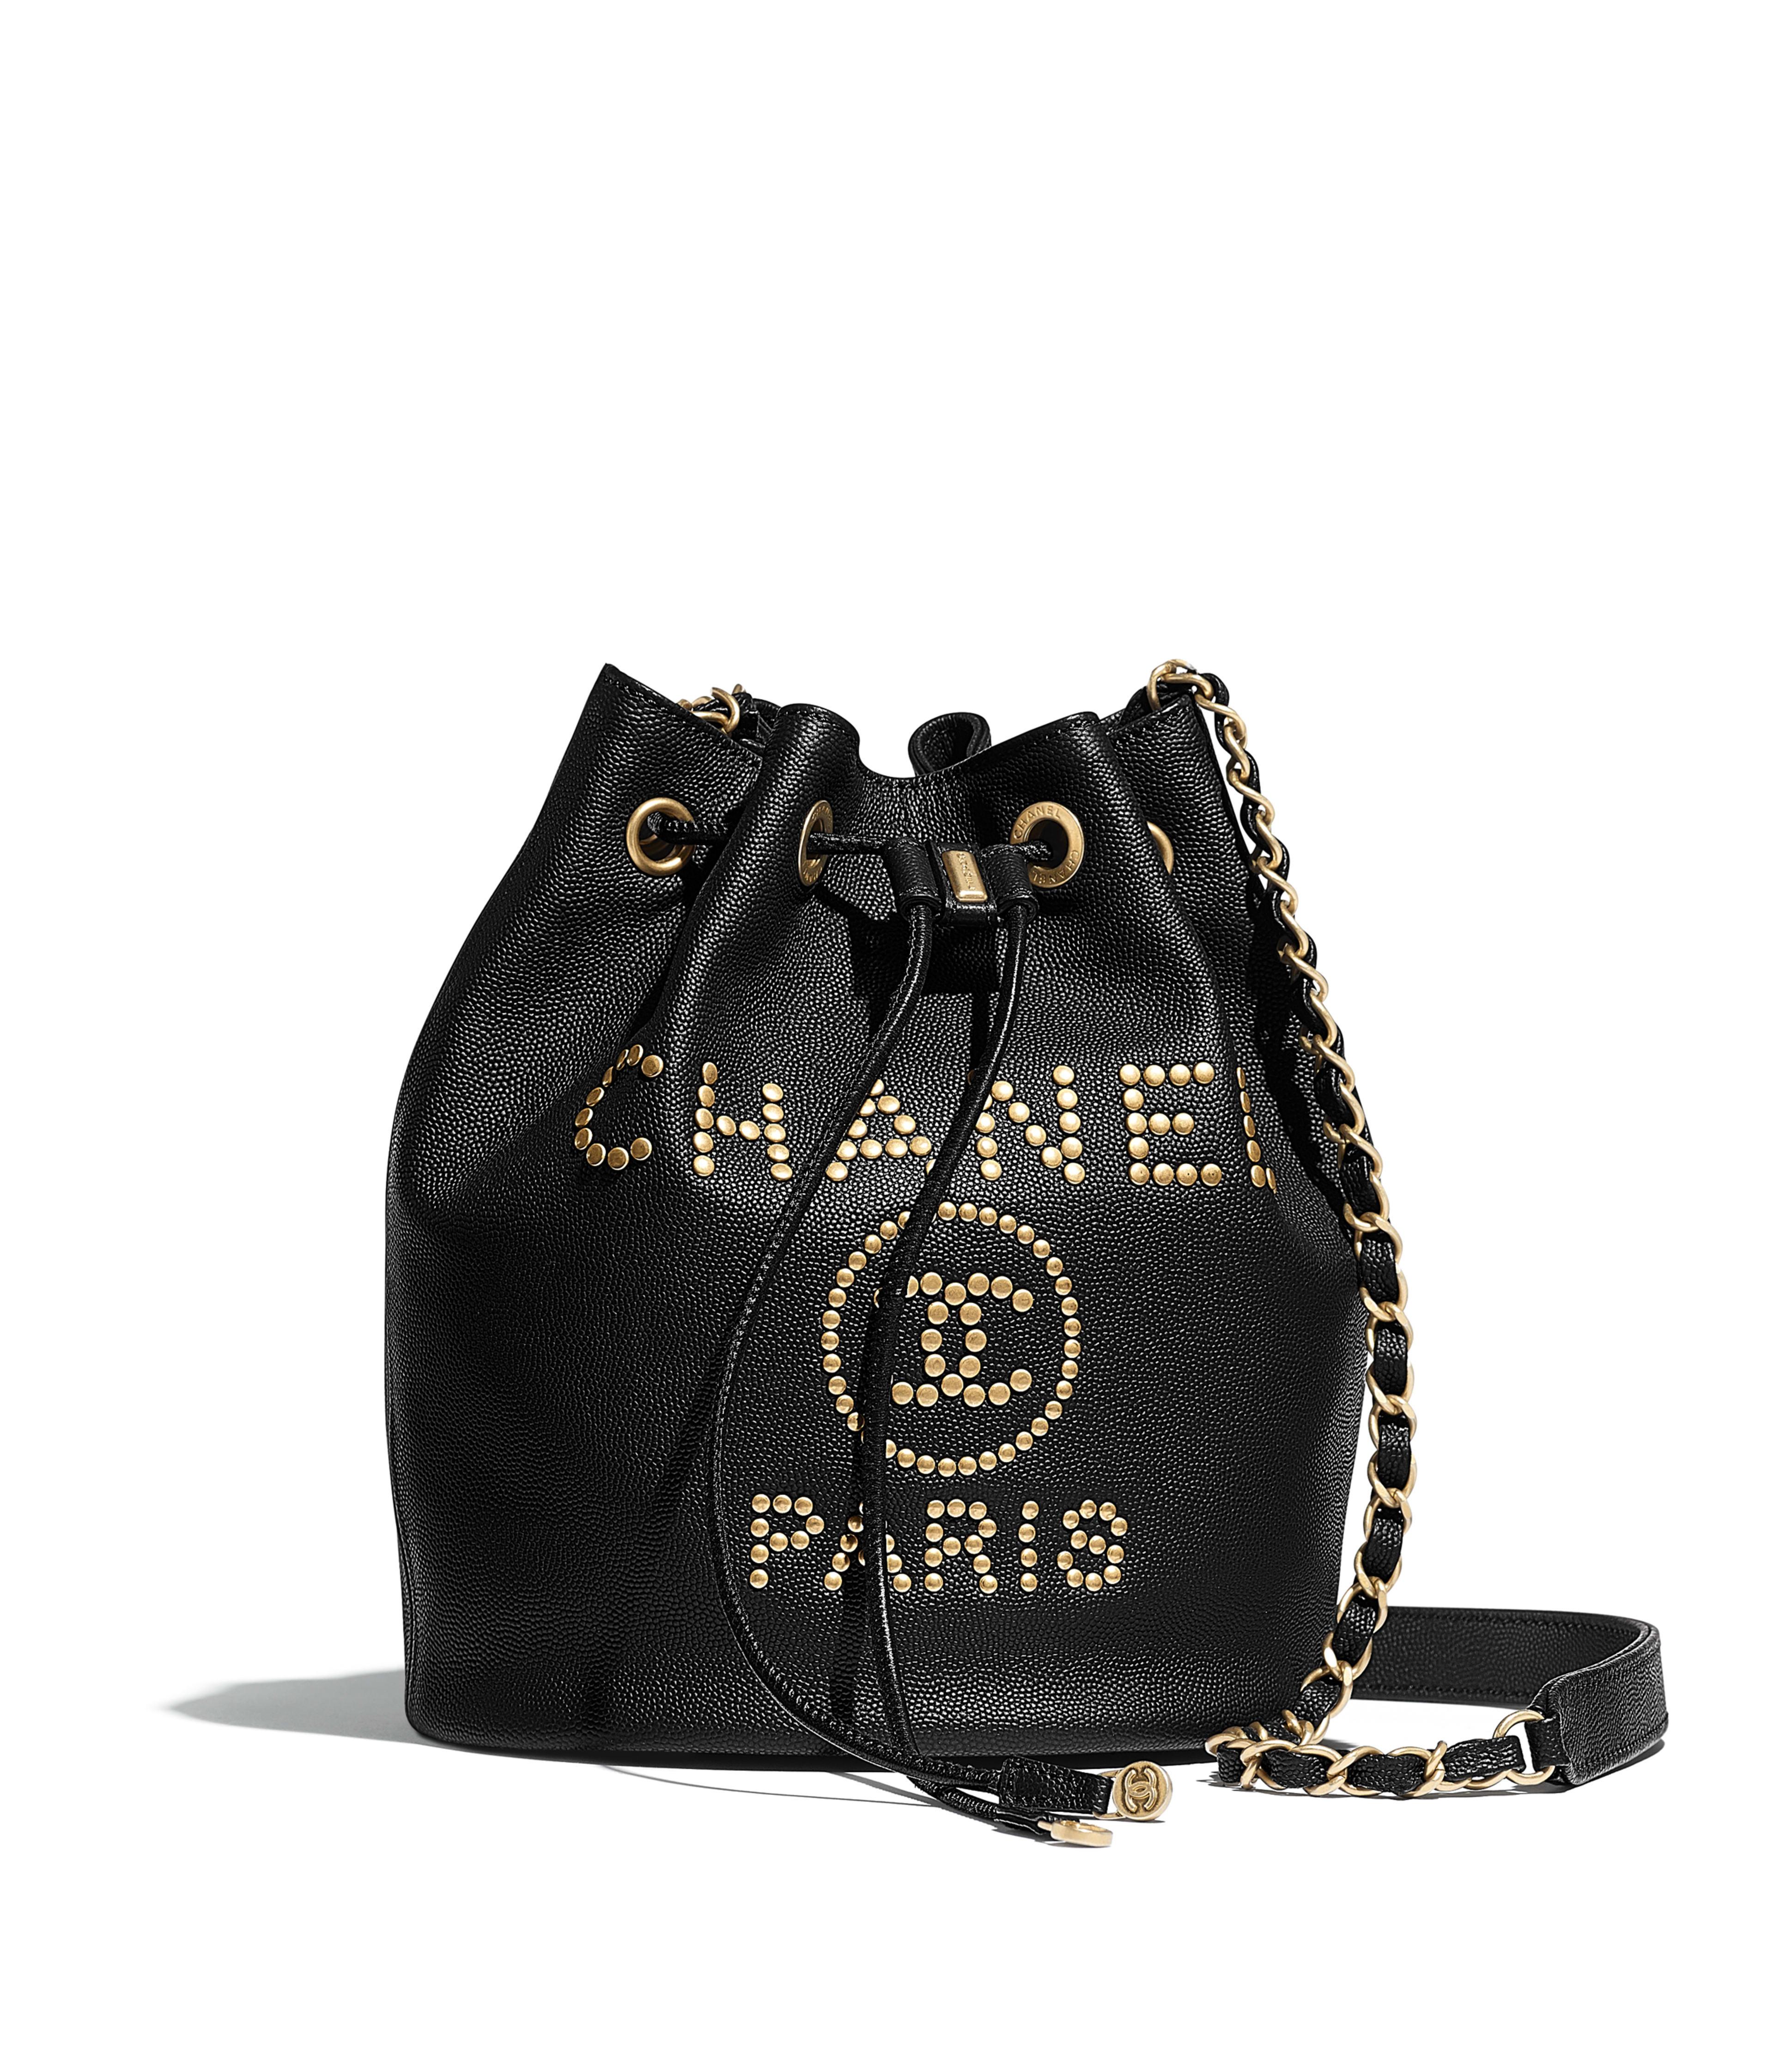 511a50aeb Small Drawstring Bag Grained Calfskin & Gold-Tone Metal, Black Ref.  AS1045B0128694305